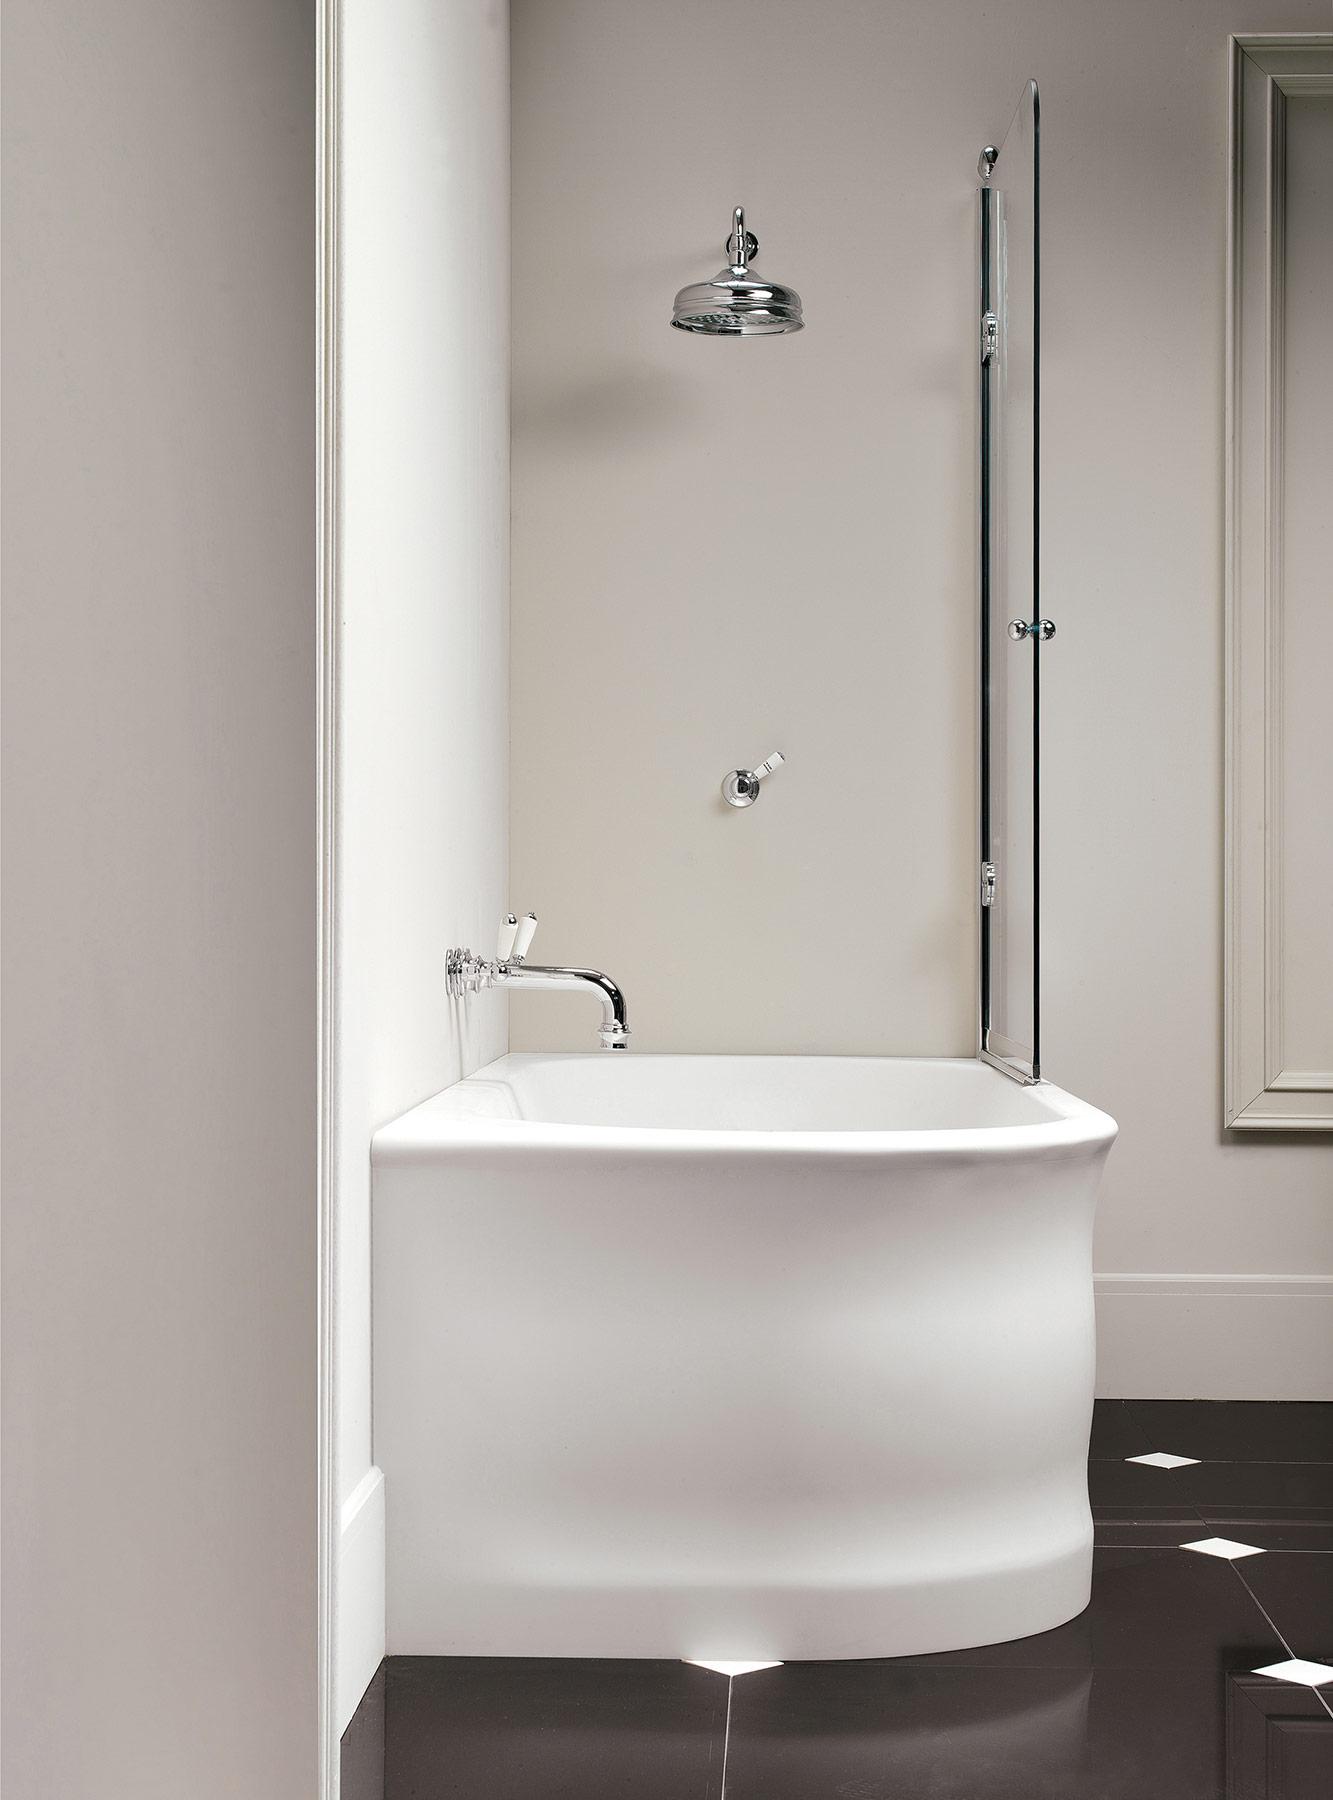 Modern Wave Freestanding Bathtub